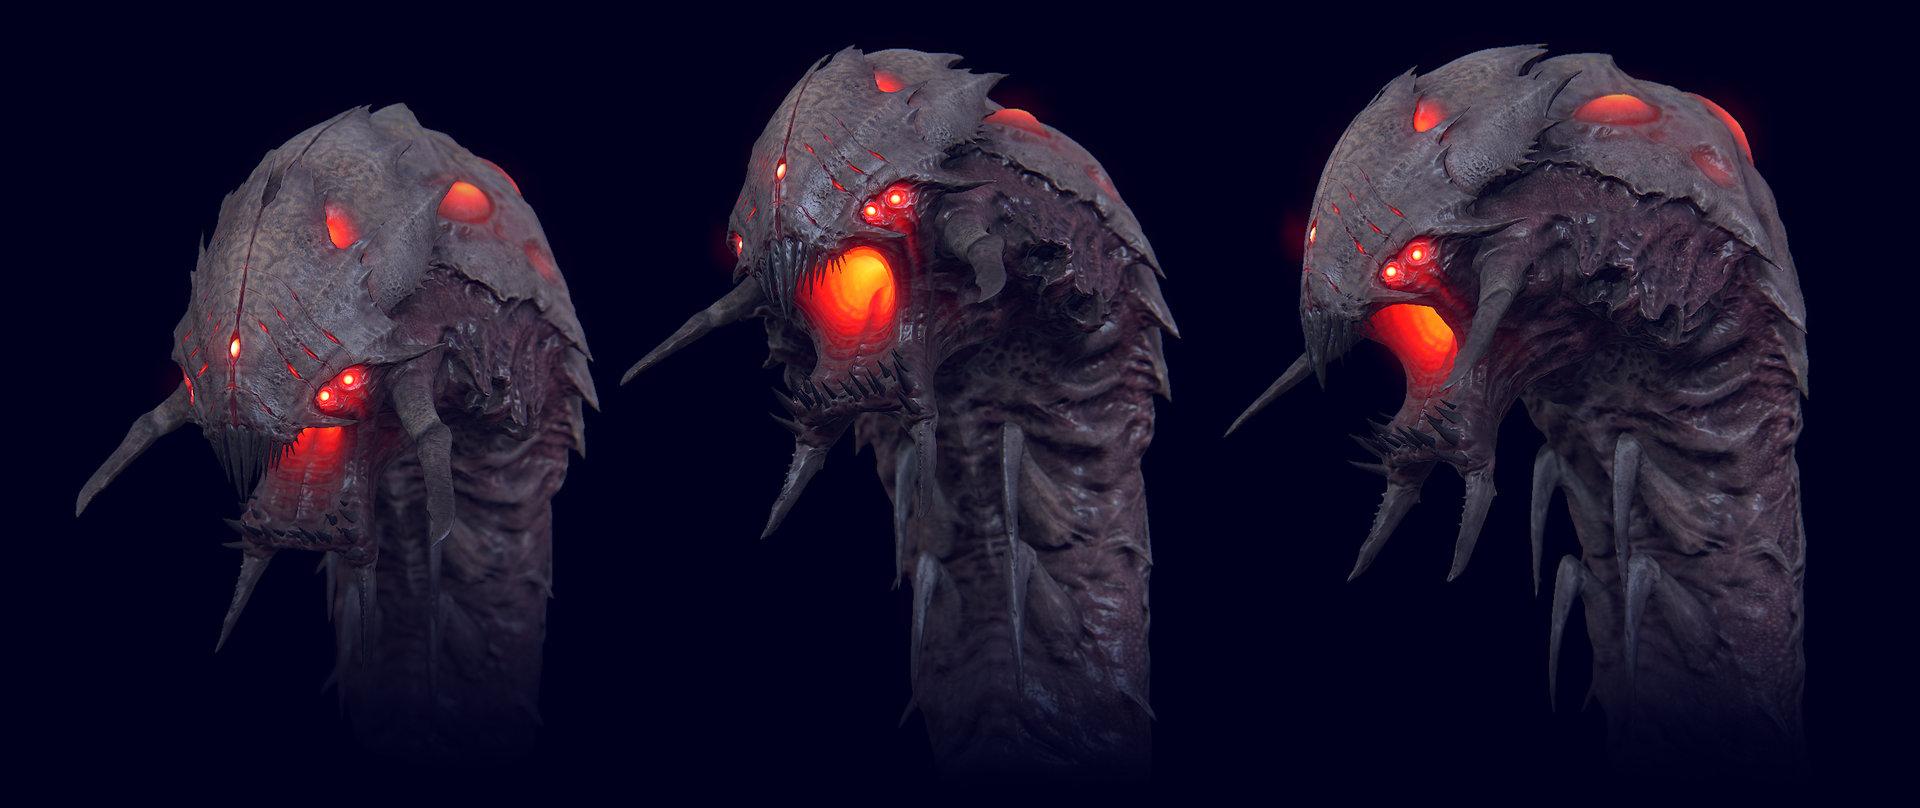 Artstation Kraken Alien Call Of Duty Ghosts Extinction Mode Christopher George